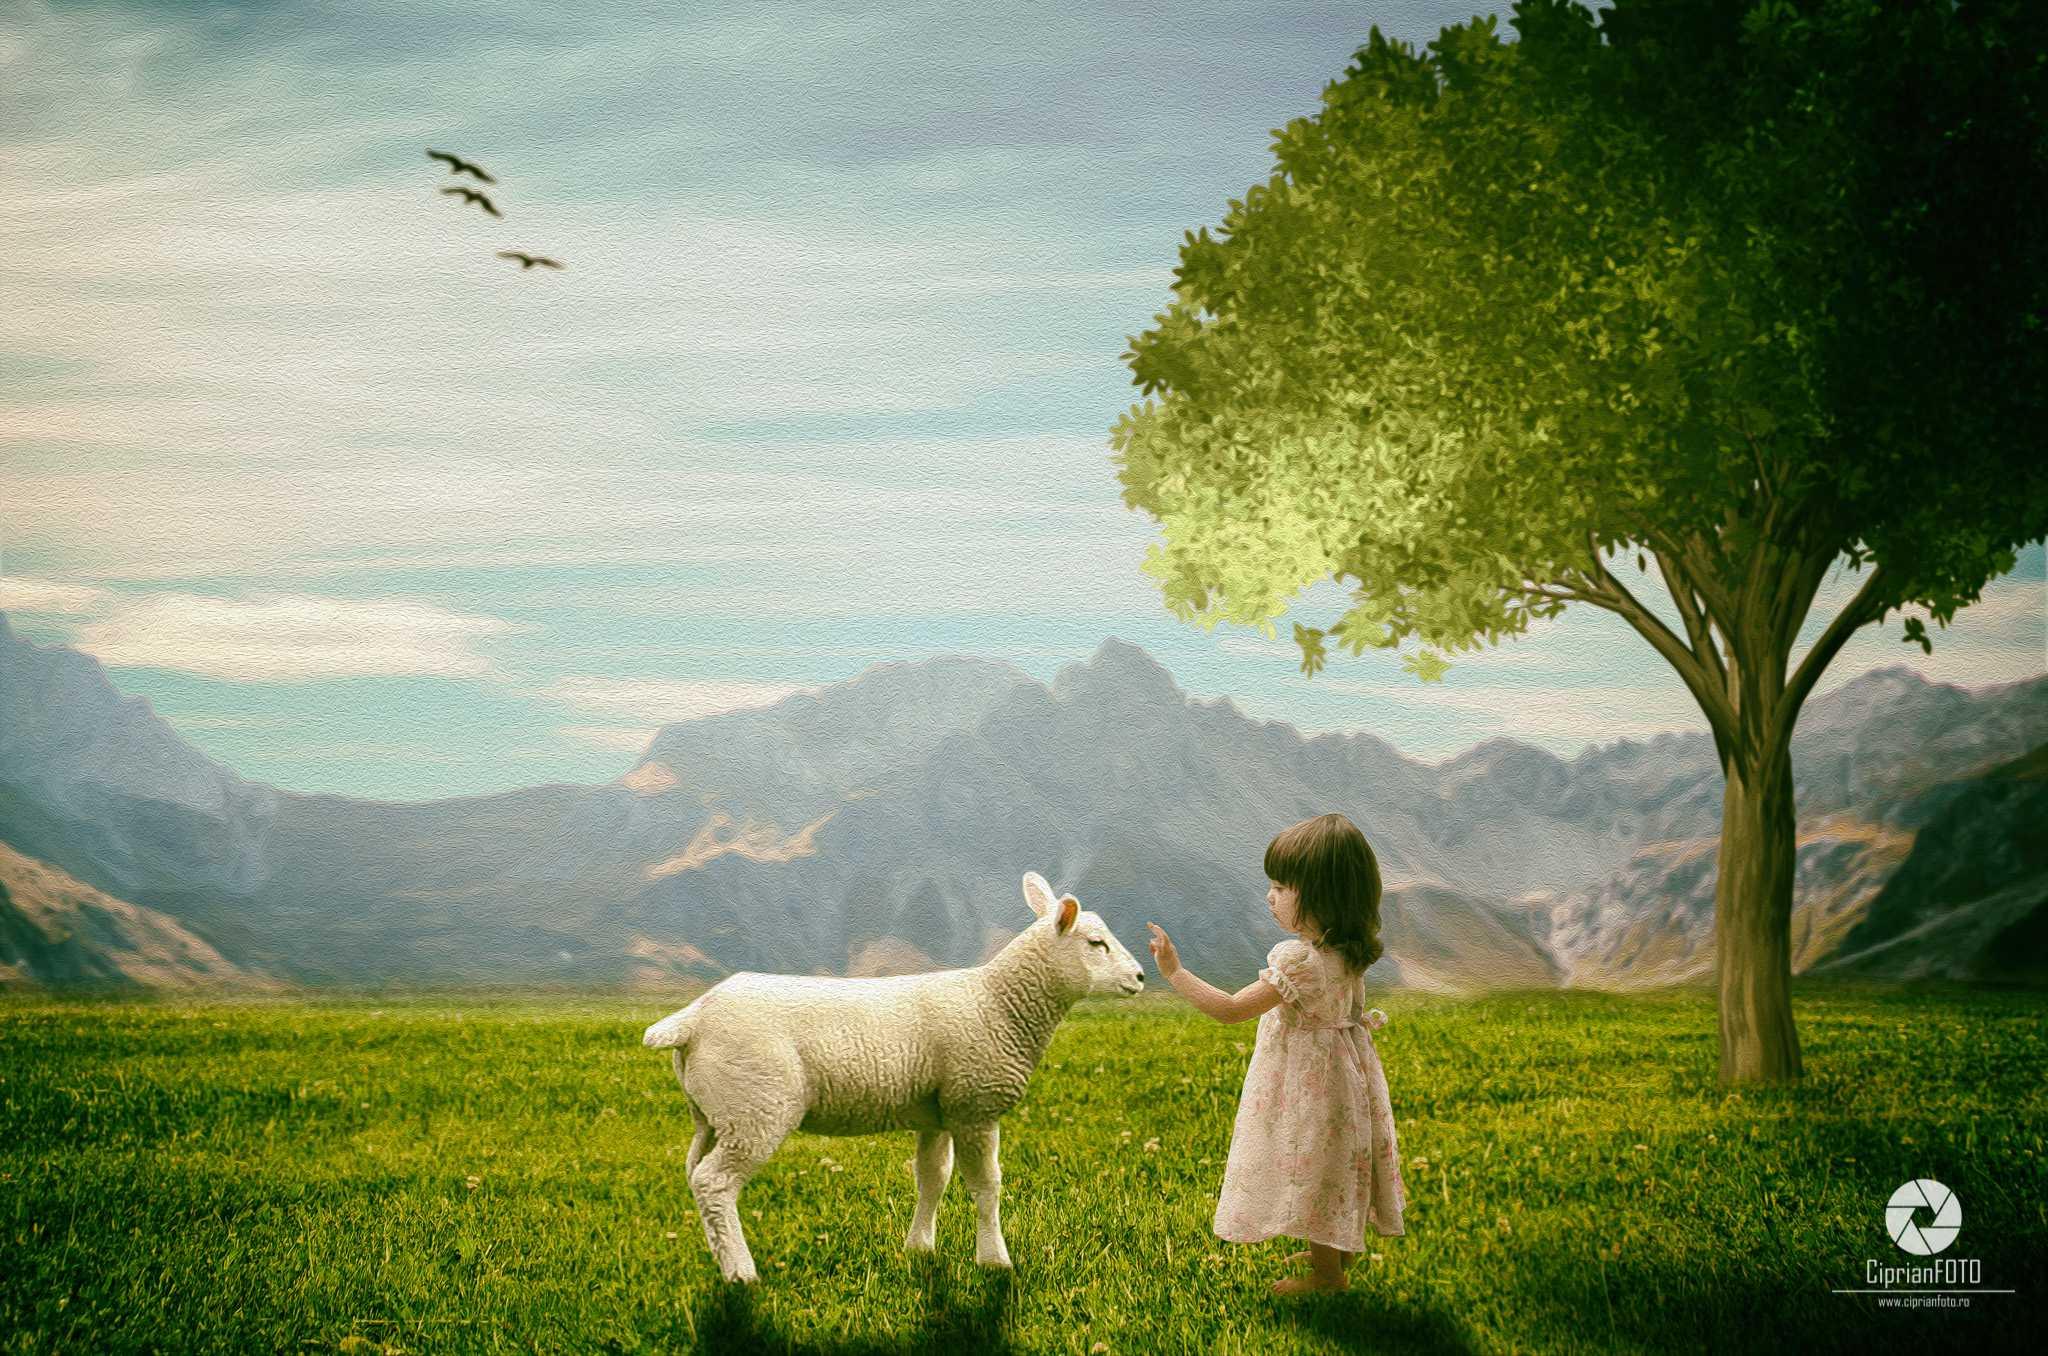 Little Girl And Sheep, Photoshop Manipulation Tutorial, CiprianFOTO